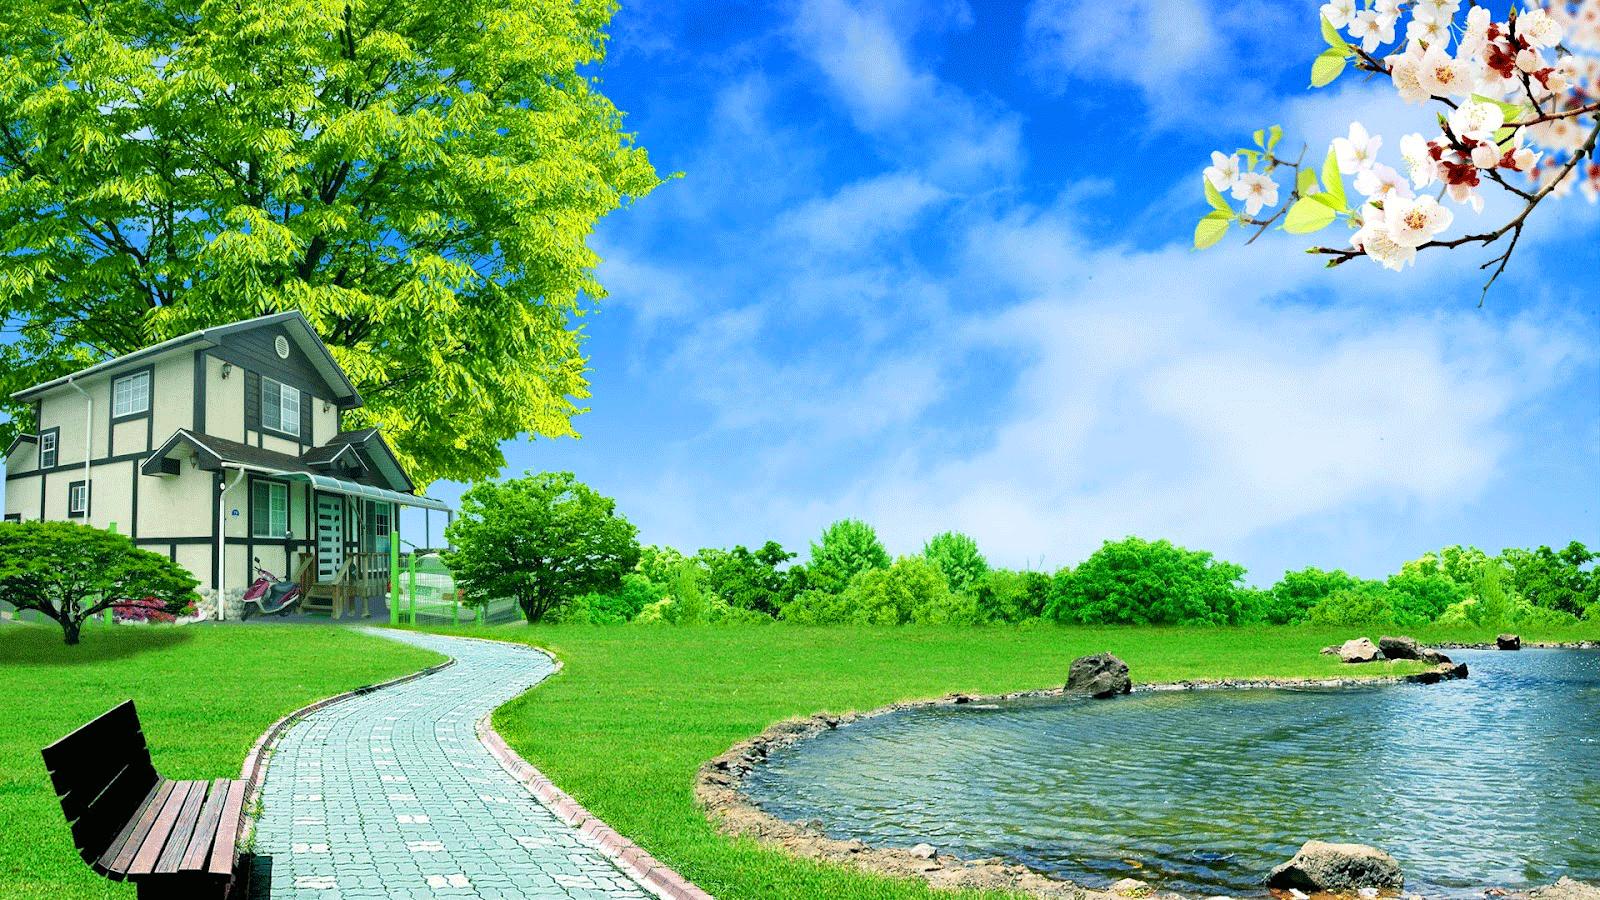 Fable Is Beautiful Theme Built For Blogging Desktop Background Nature Beautiful Photos Of Nature Beautiful Nature Wallpaper